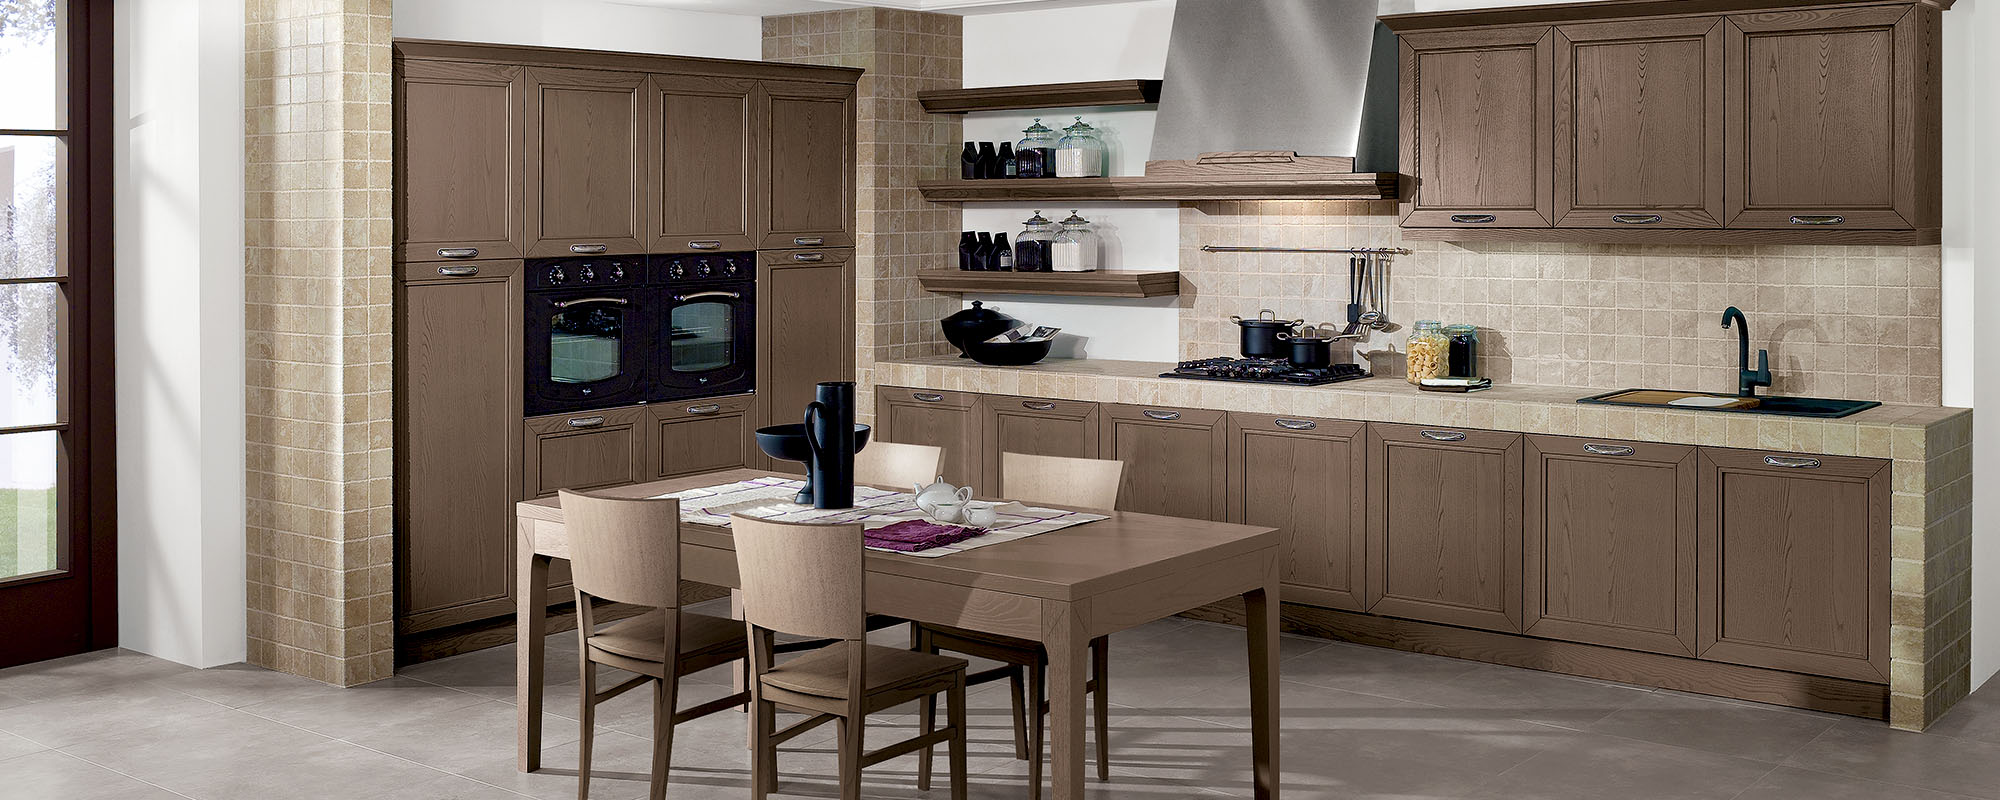 Tipologie di cucine